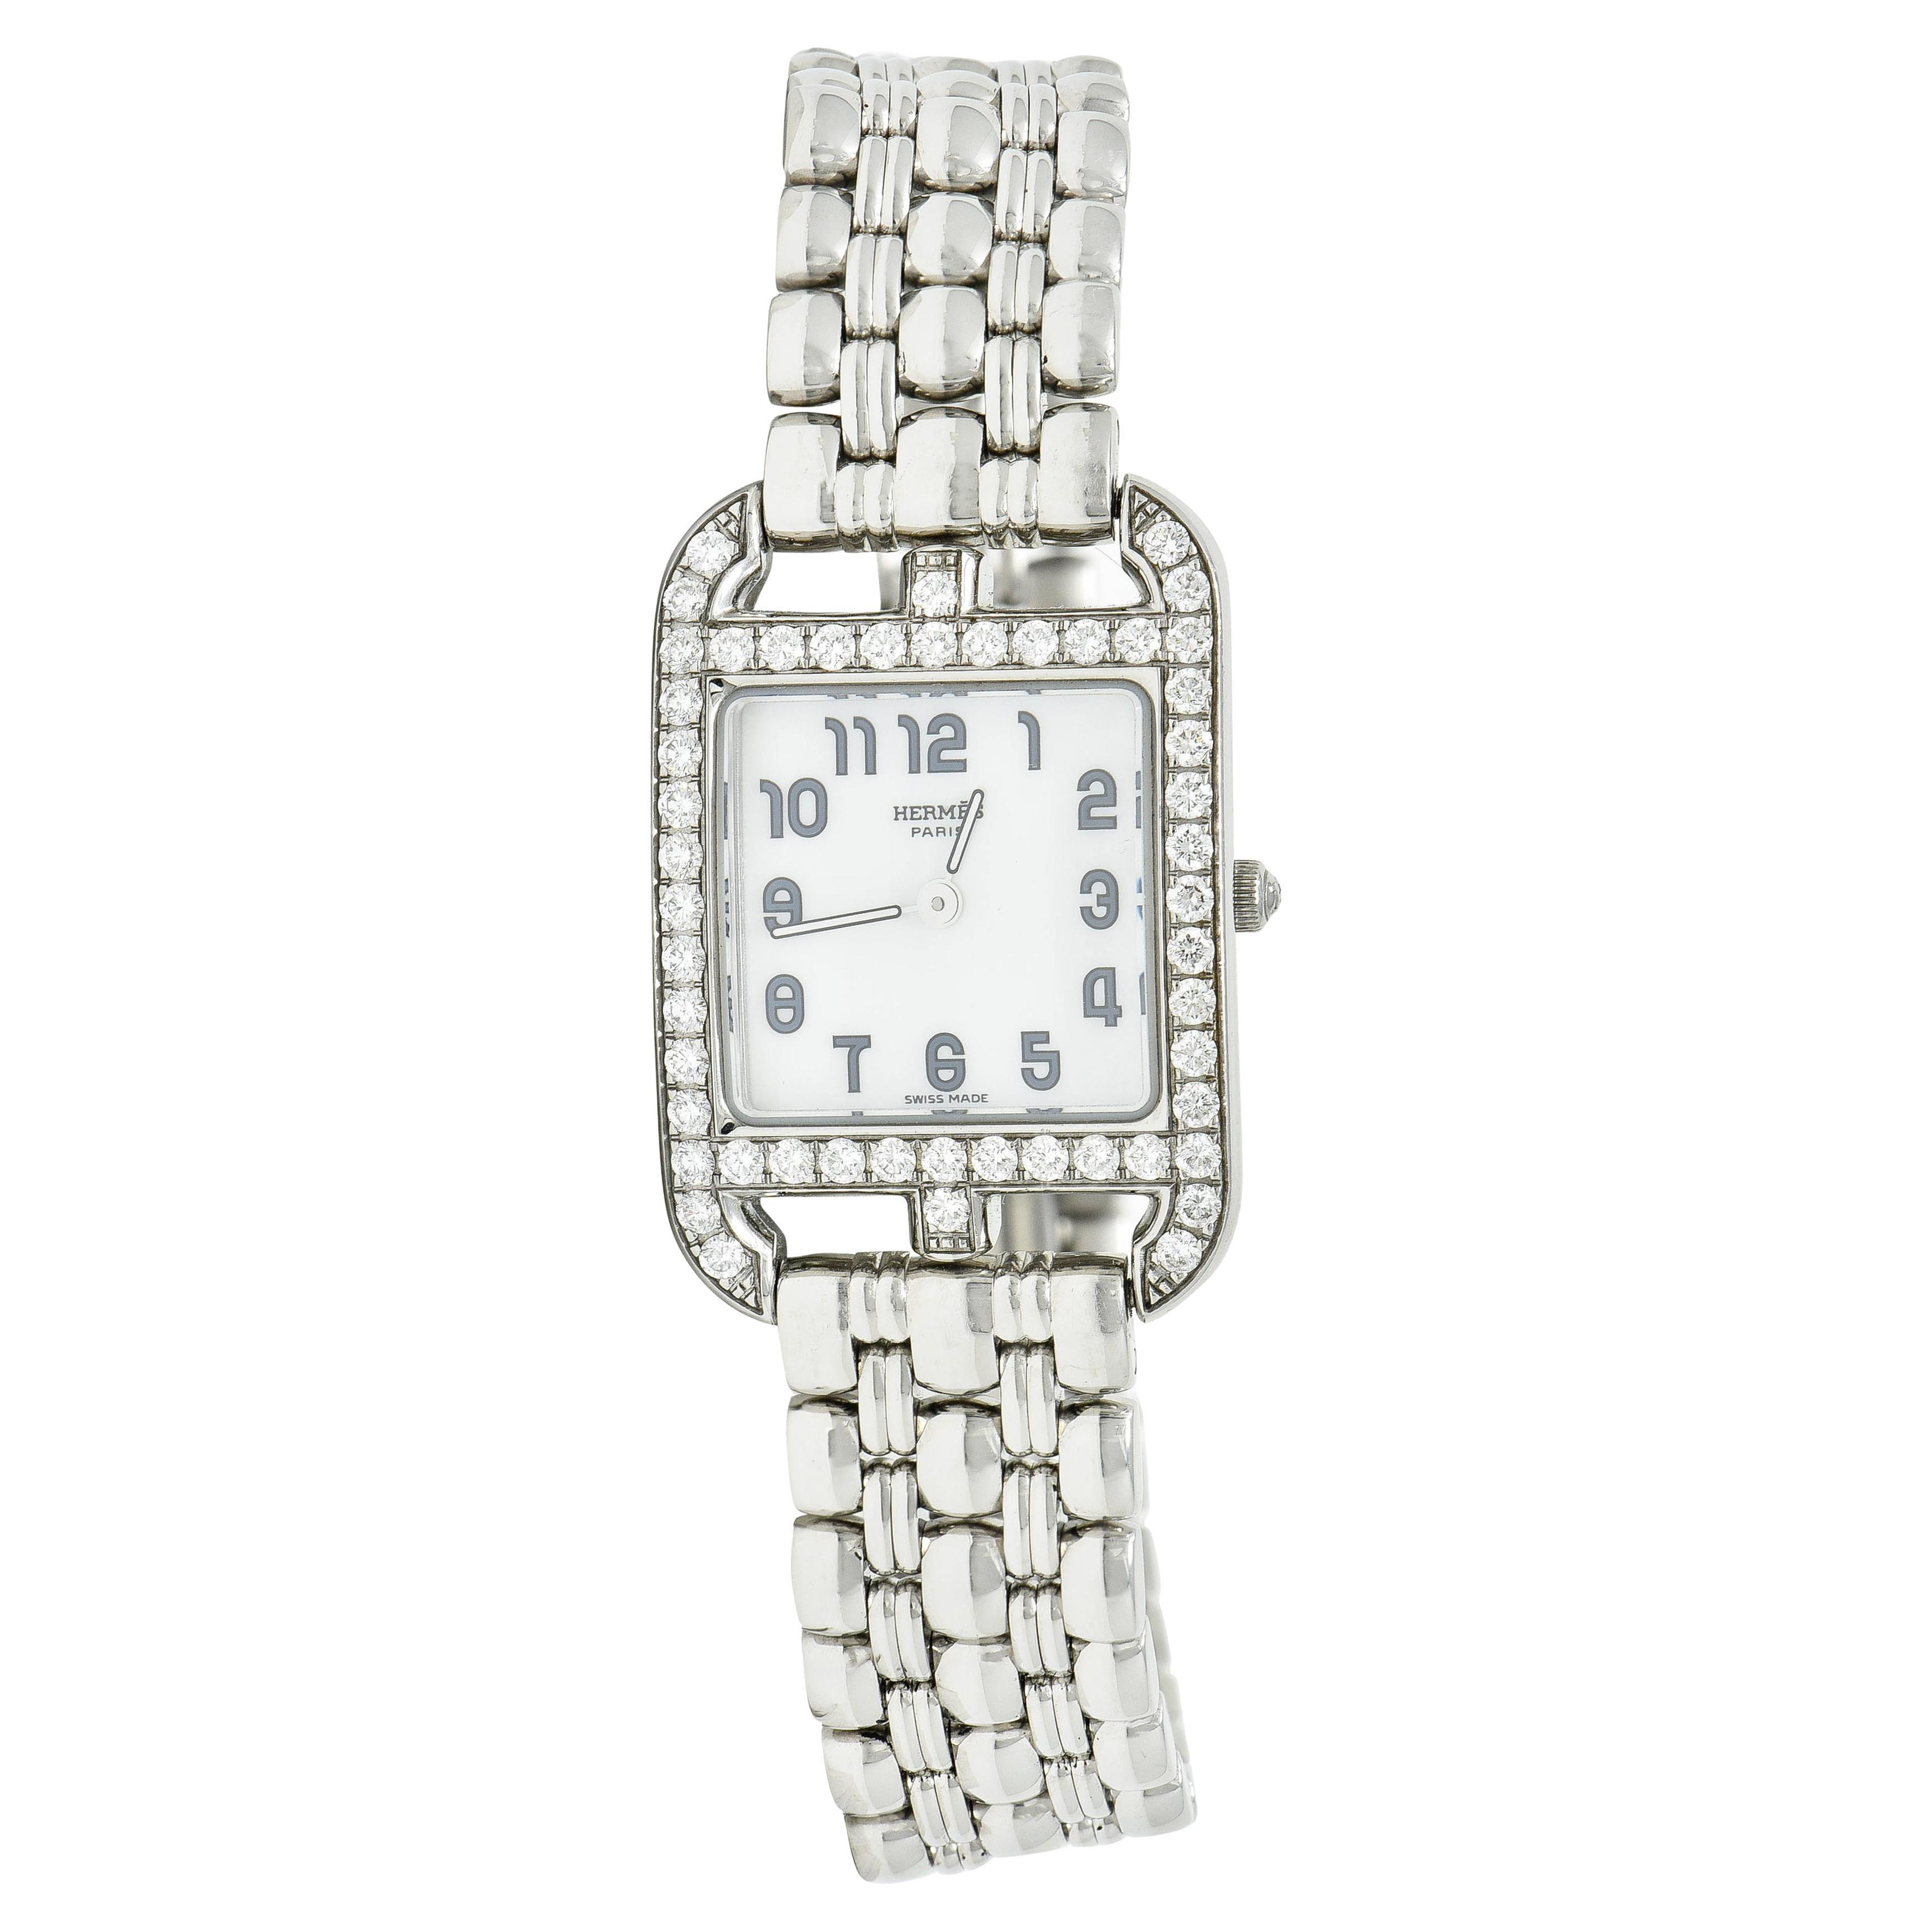 Hermes 1.25 Carats Diamond Stainless Steel Cape Cod Watch Bracelet